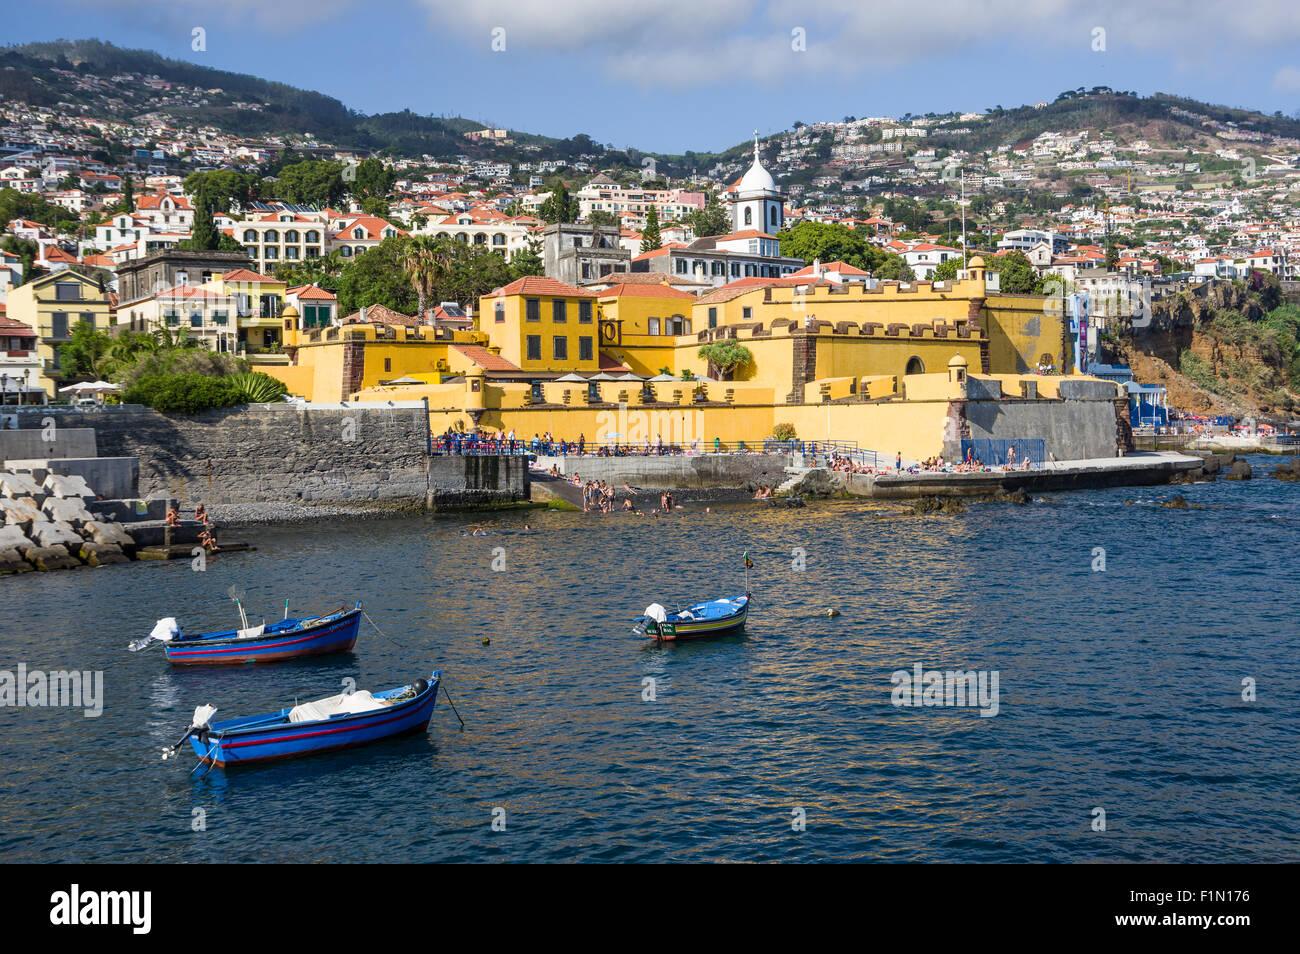 Fort Sao Tiago - Funchal - Madeira Photo Stock